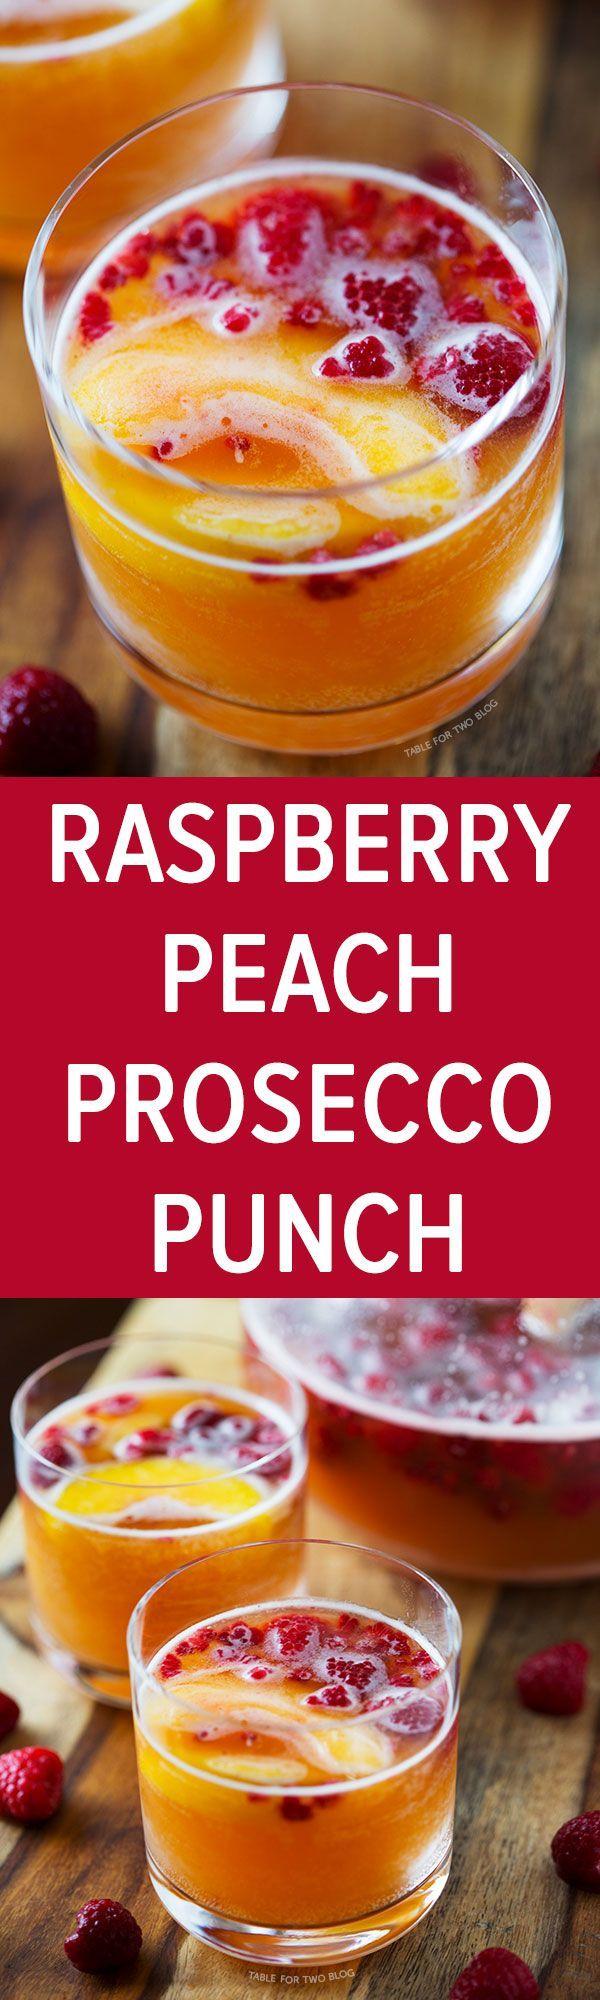 Raspberry Peach Prosecco Punch | www.tablefortwoblog.com